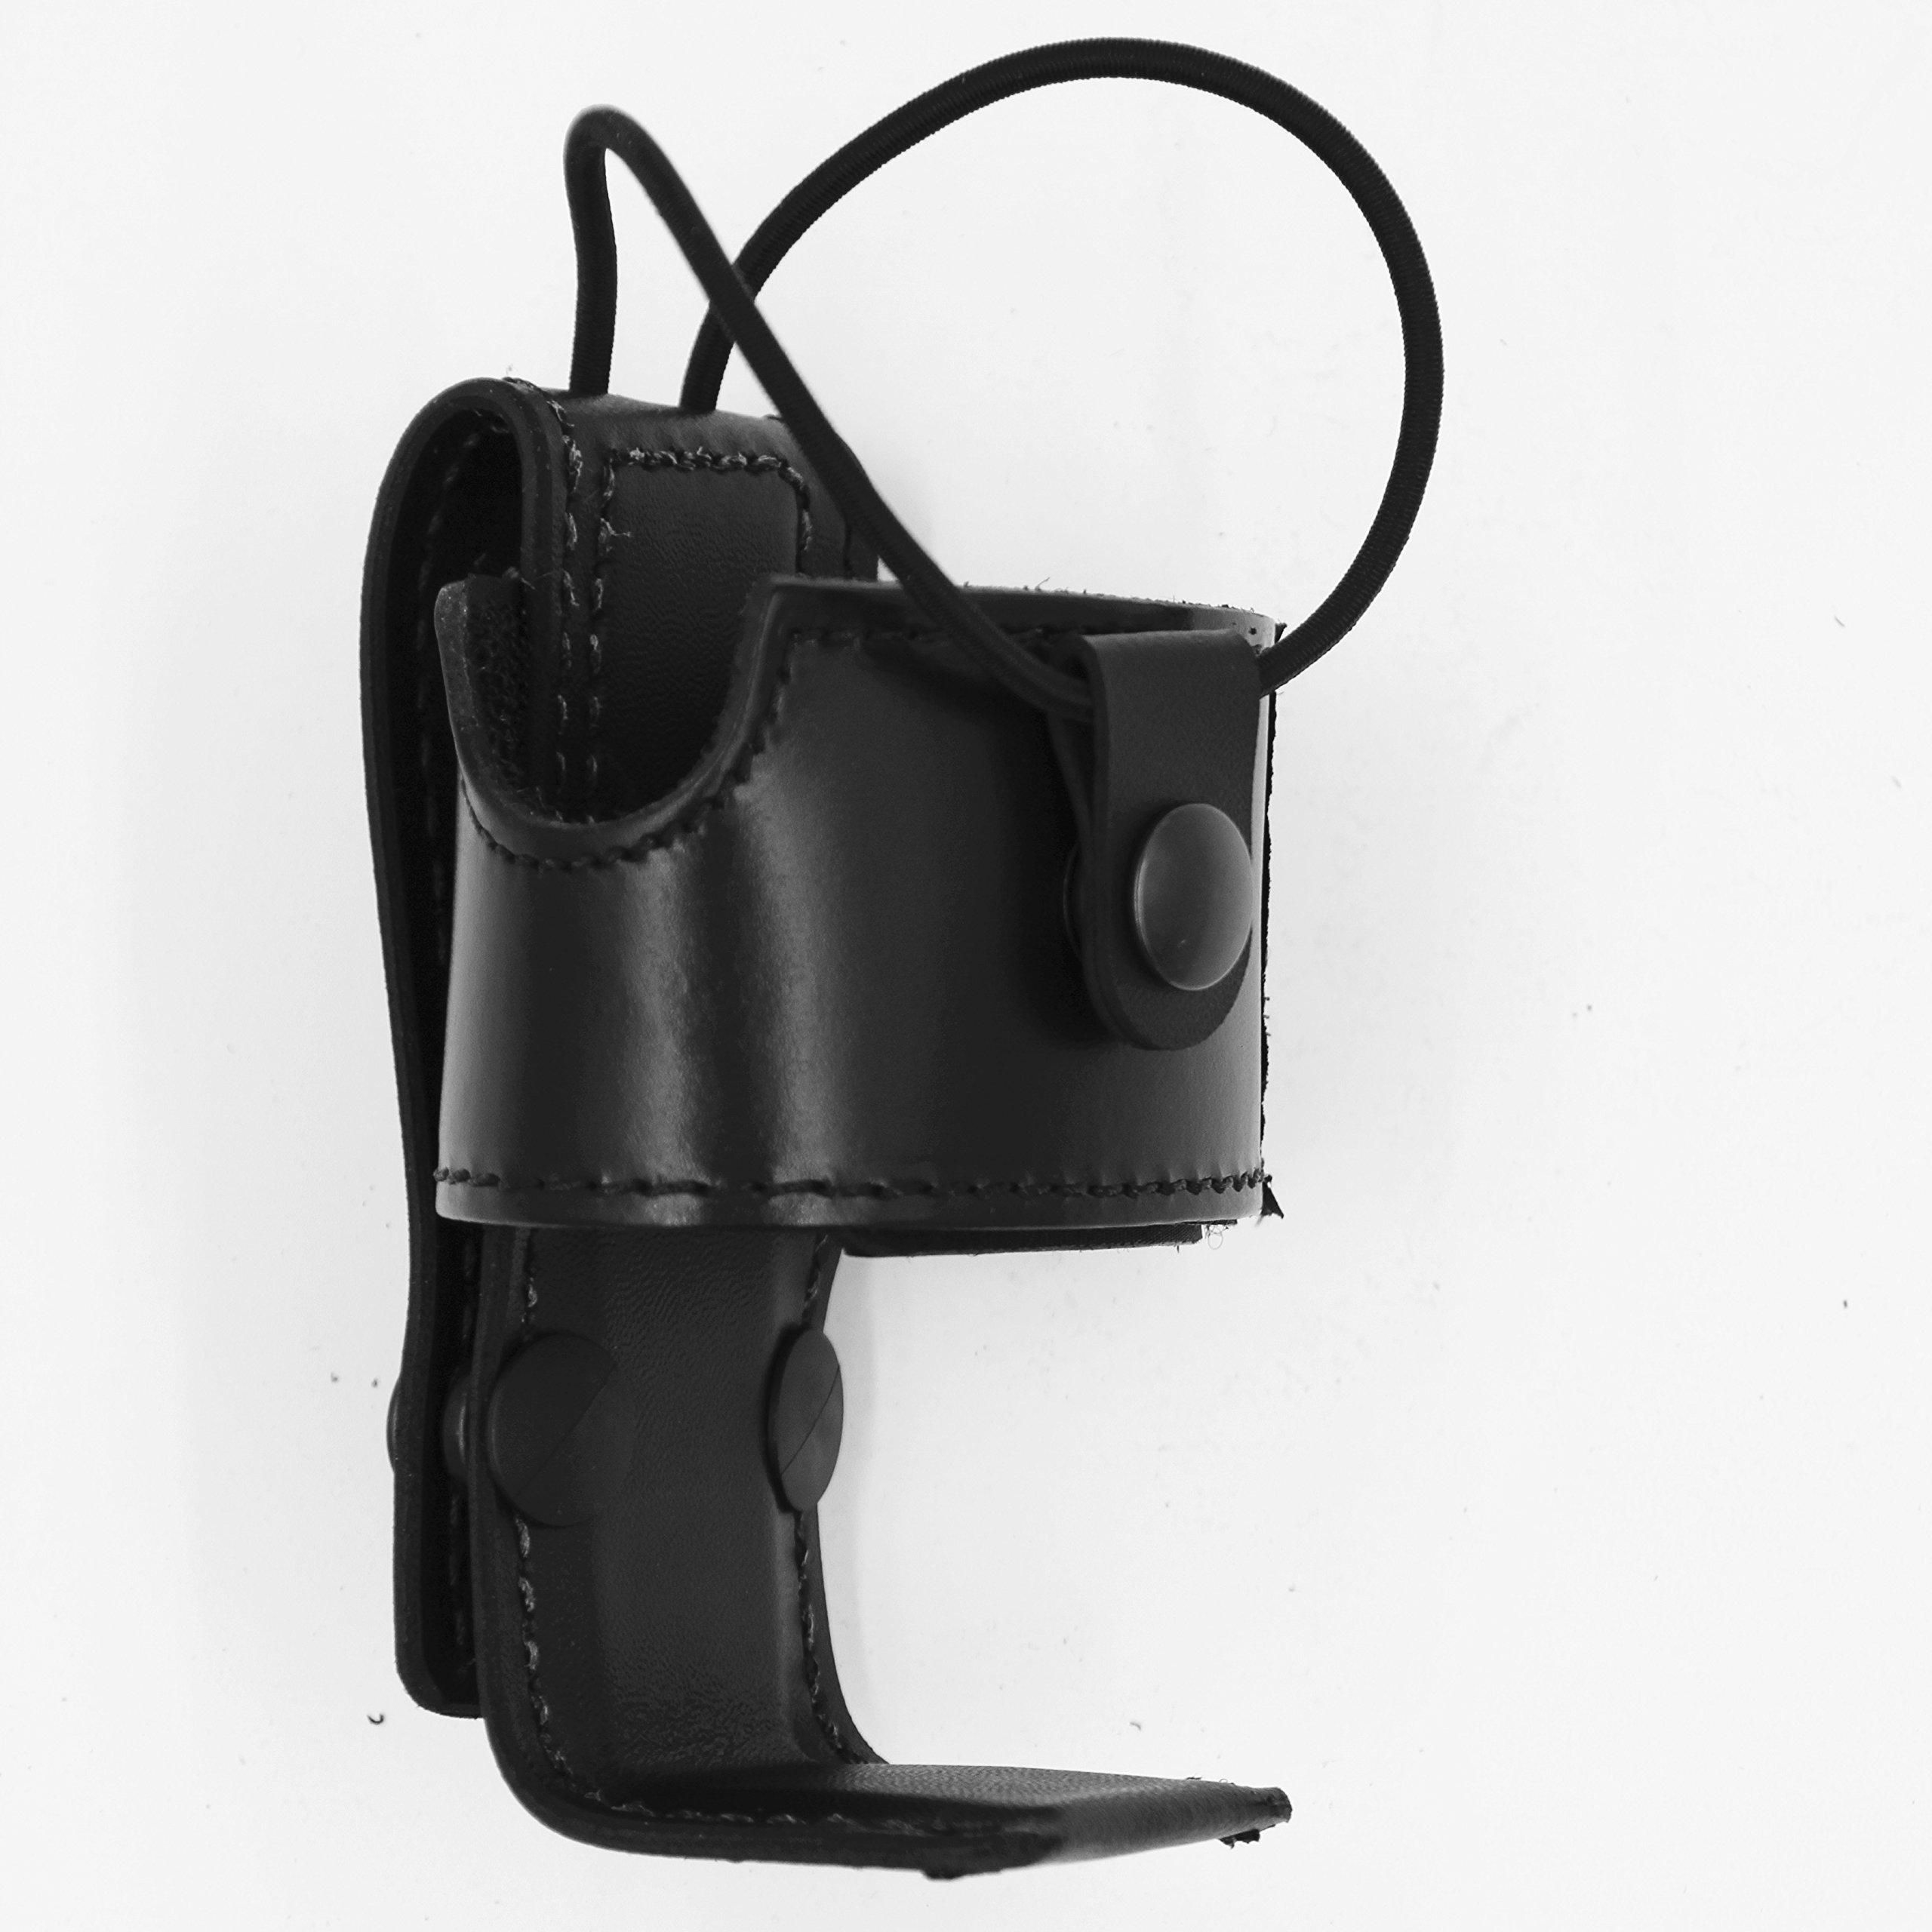 Aker Leather 588U-XTS Radio Holder, Universal for Motorola XTS3000